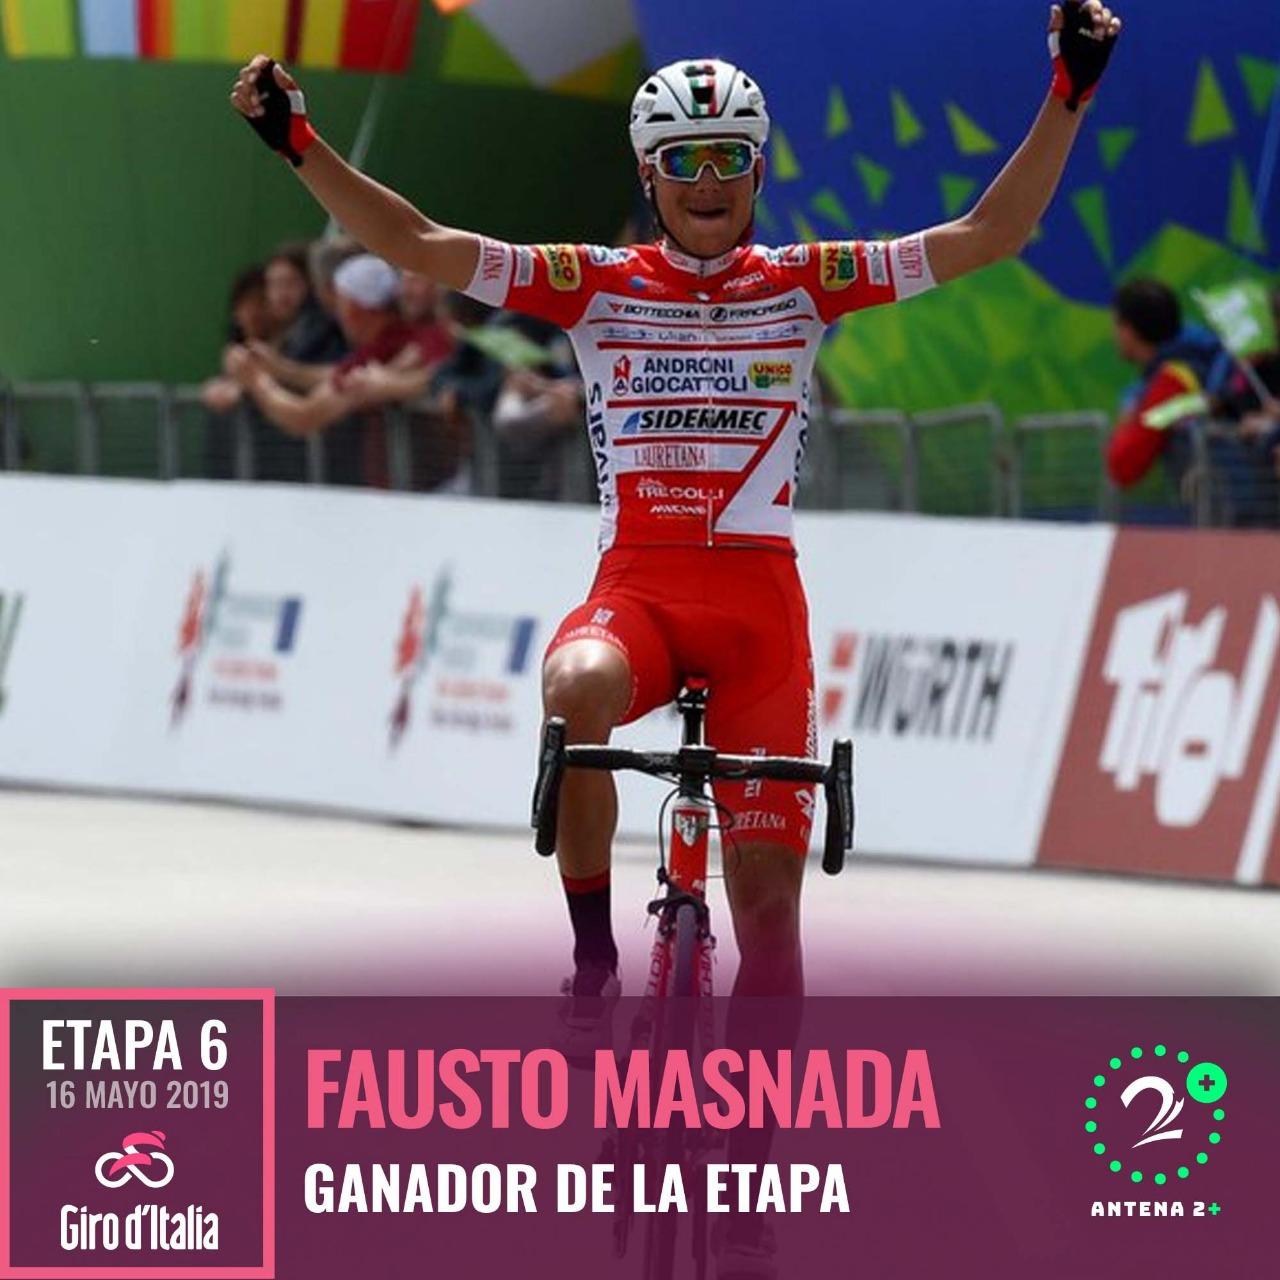 Fausto Masnada (Androni Giocattoli), ganador de la sexta etapa del Giro de Italia